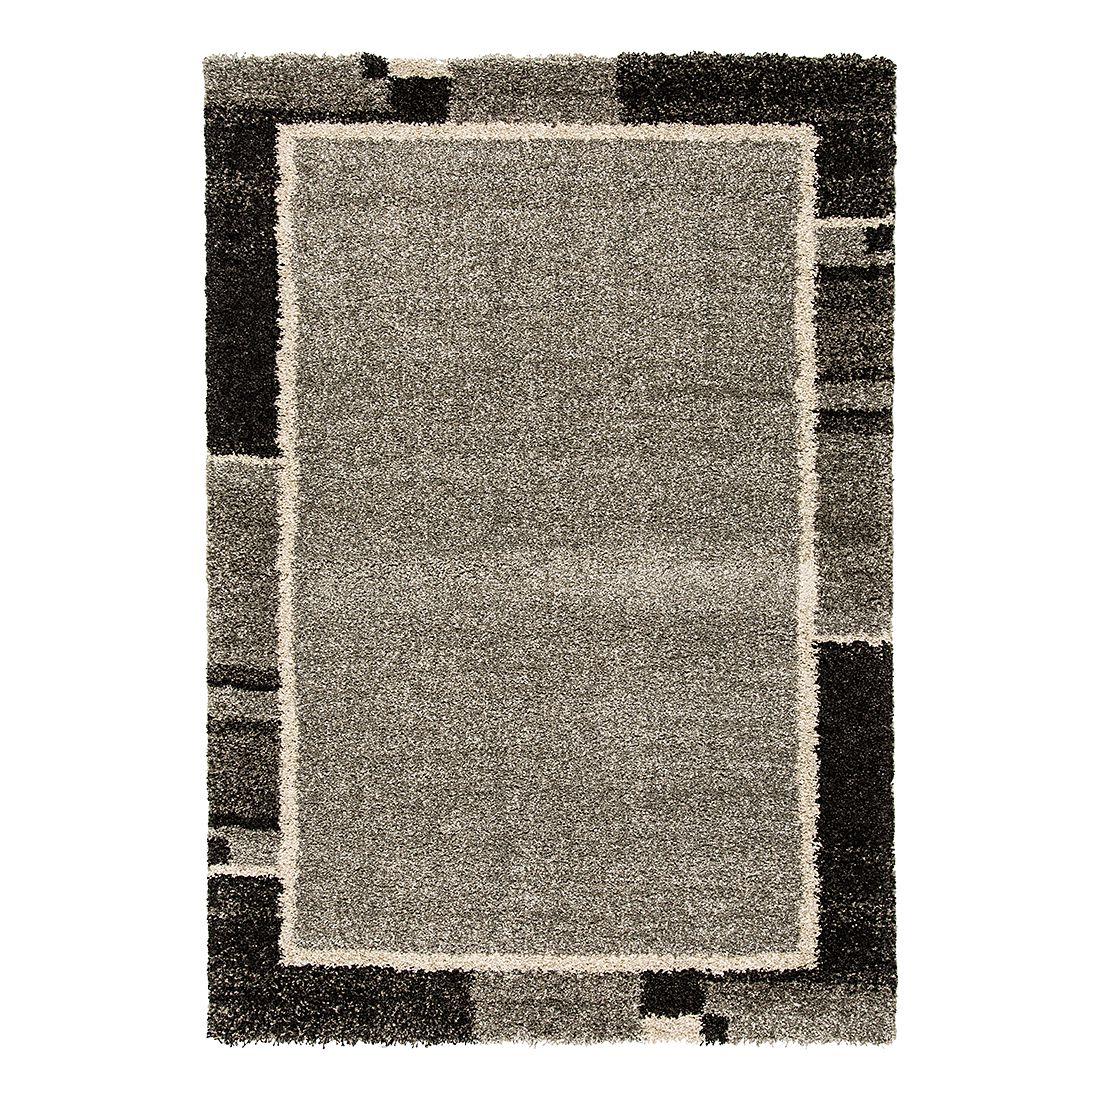 teppich design gewebt grau 140 x 200 cm home24 deko. Black Bedroom Furniture Sets. Home Design Ideas